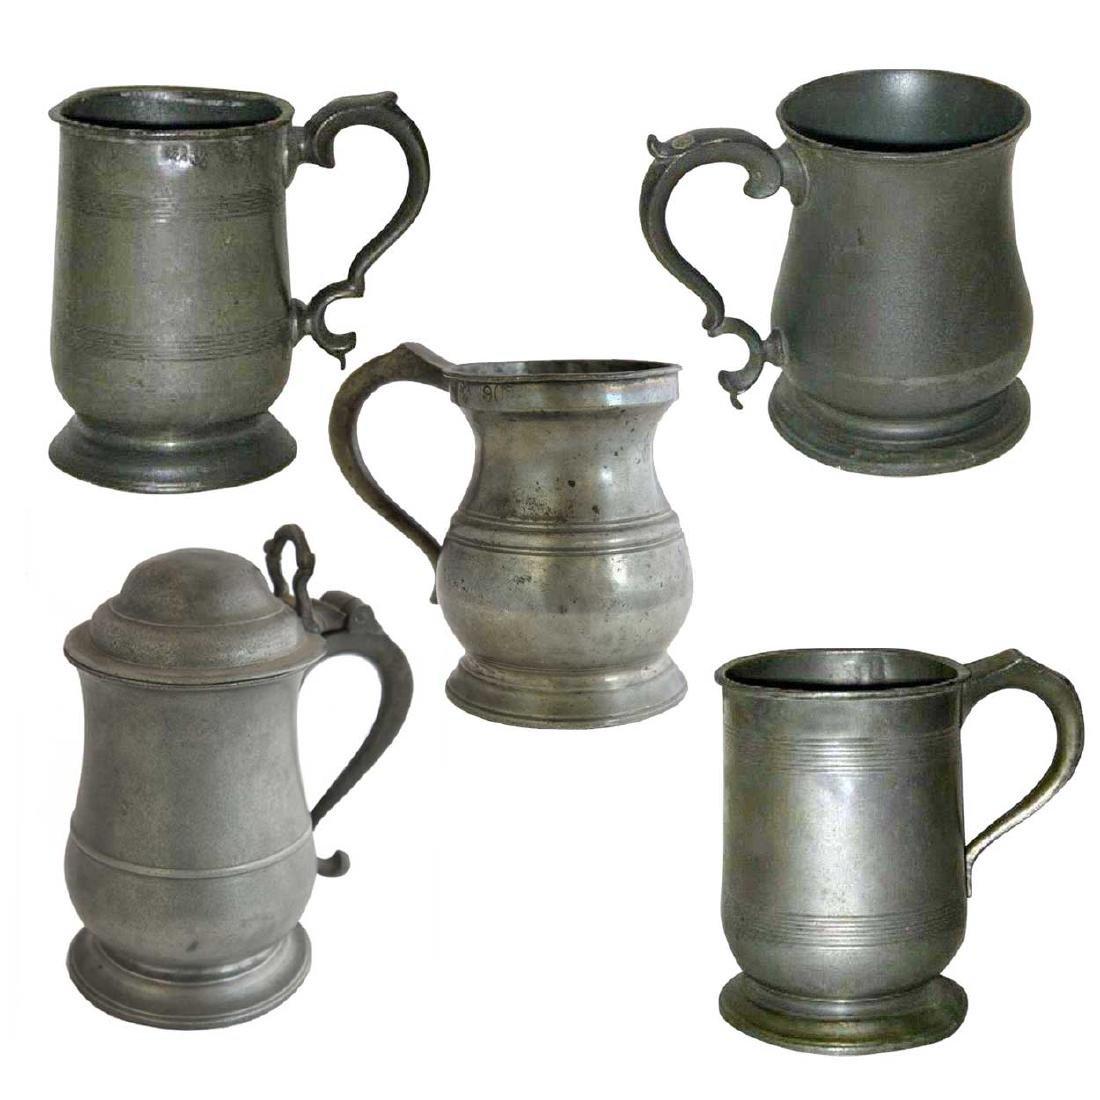 Five English Pewter Tavern Mugs and Tankards